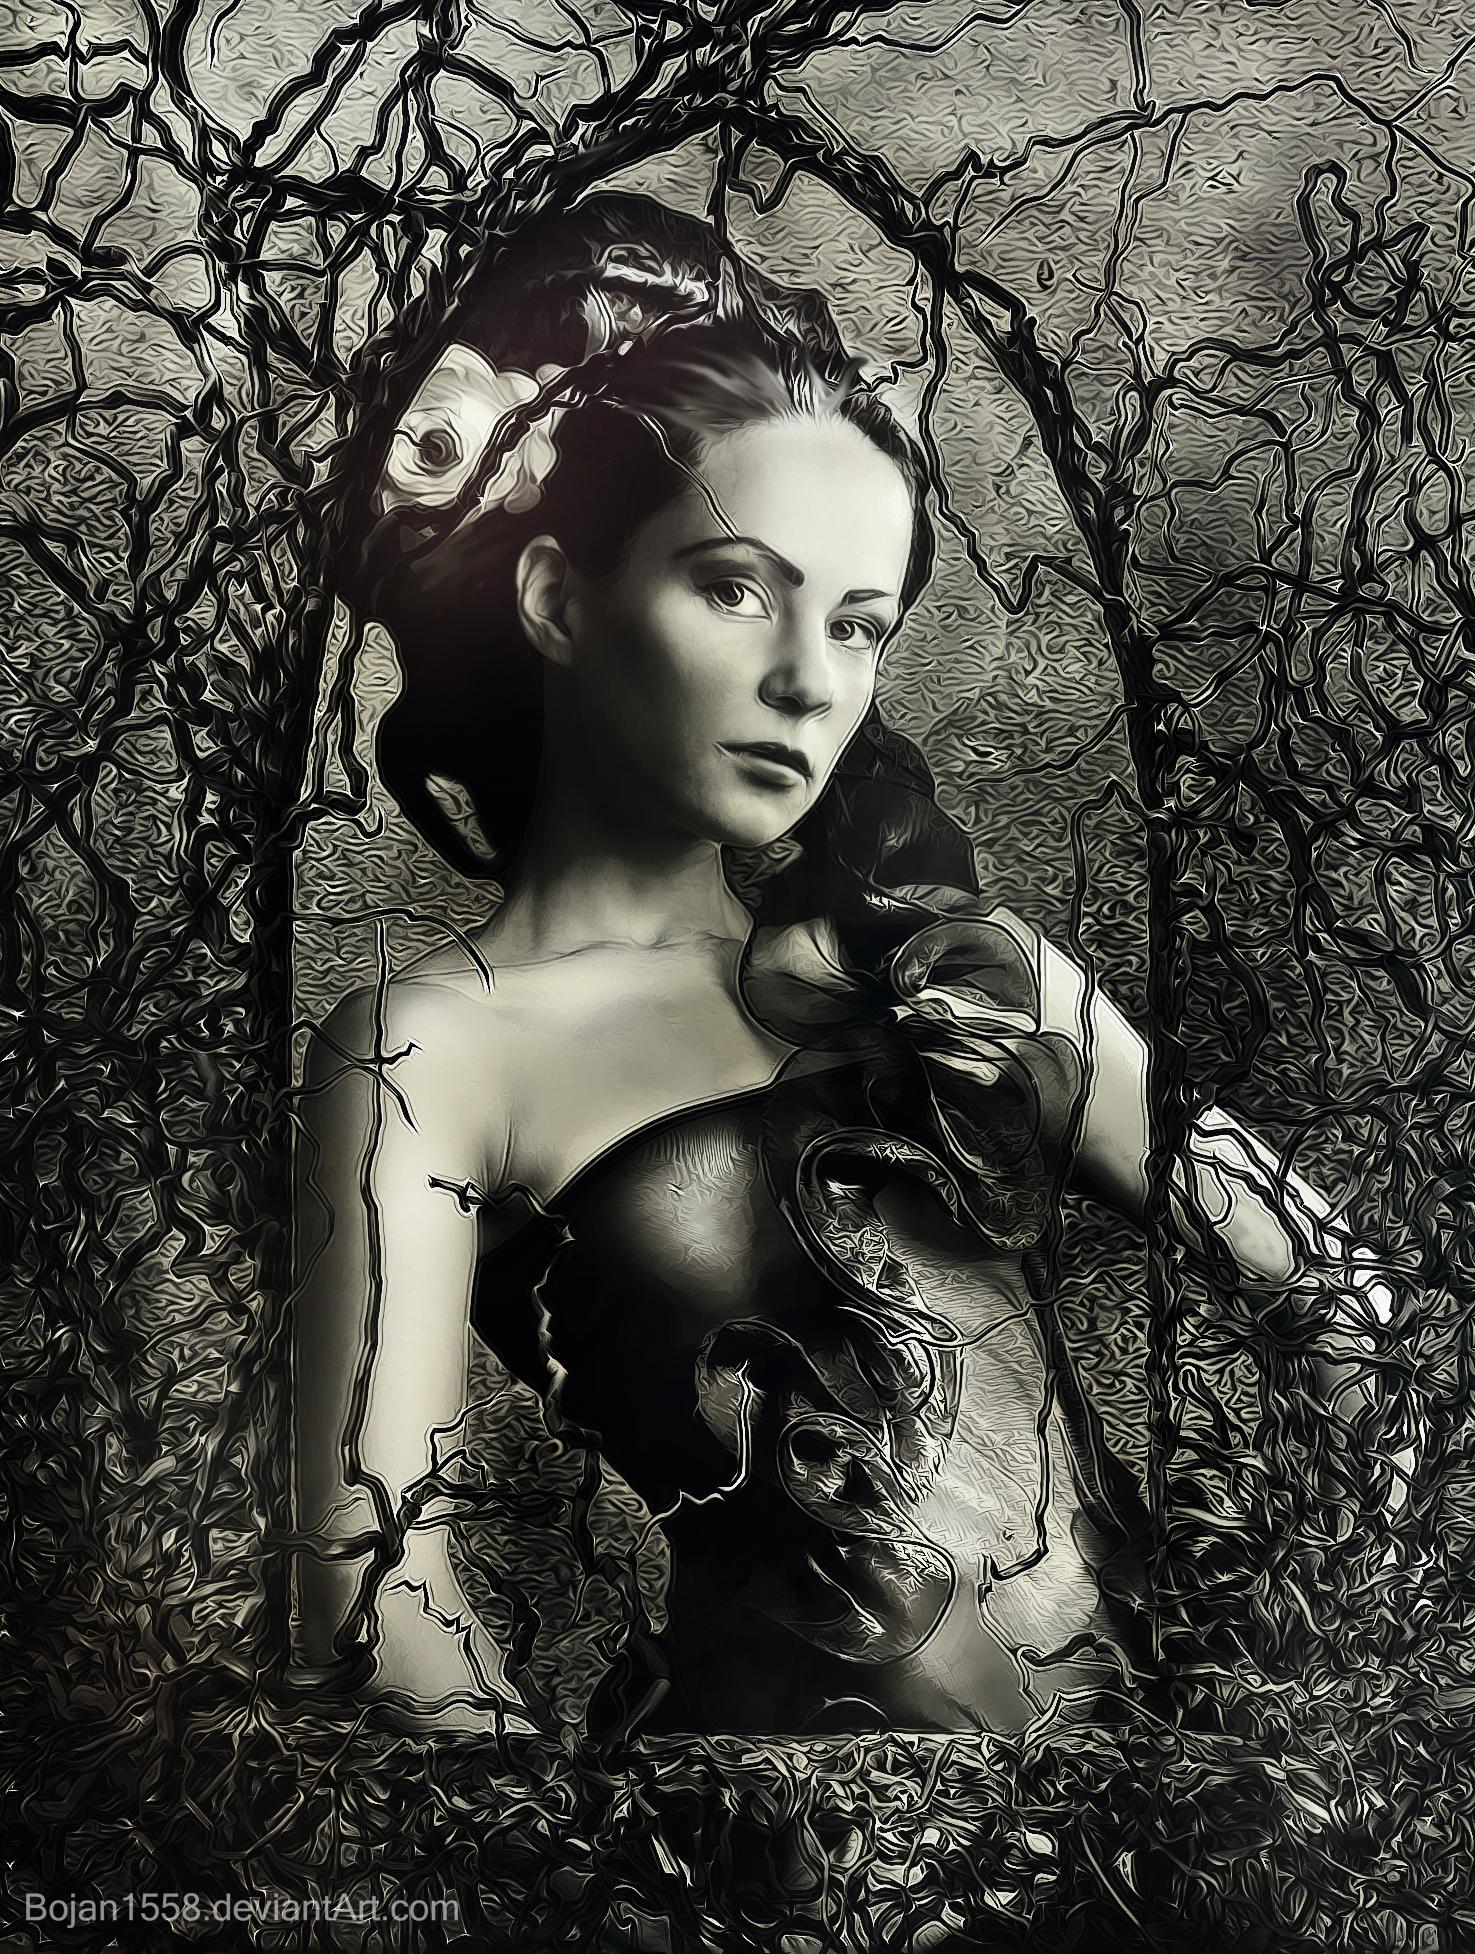 Pretty One by Bojan1558